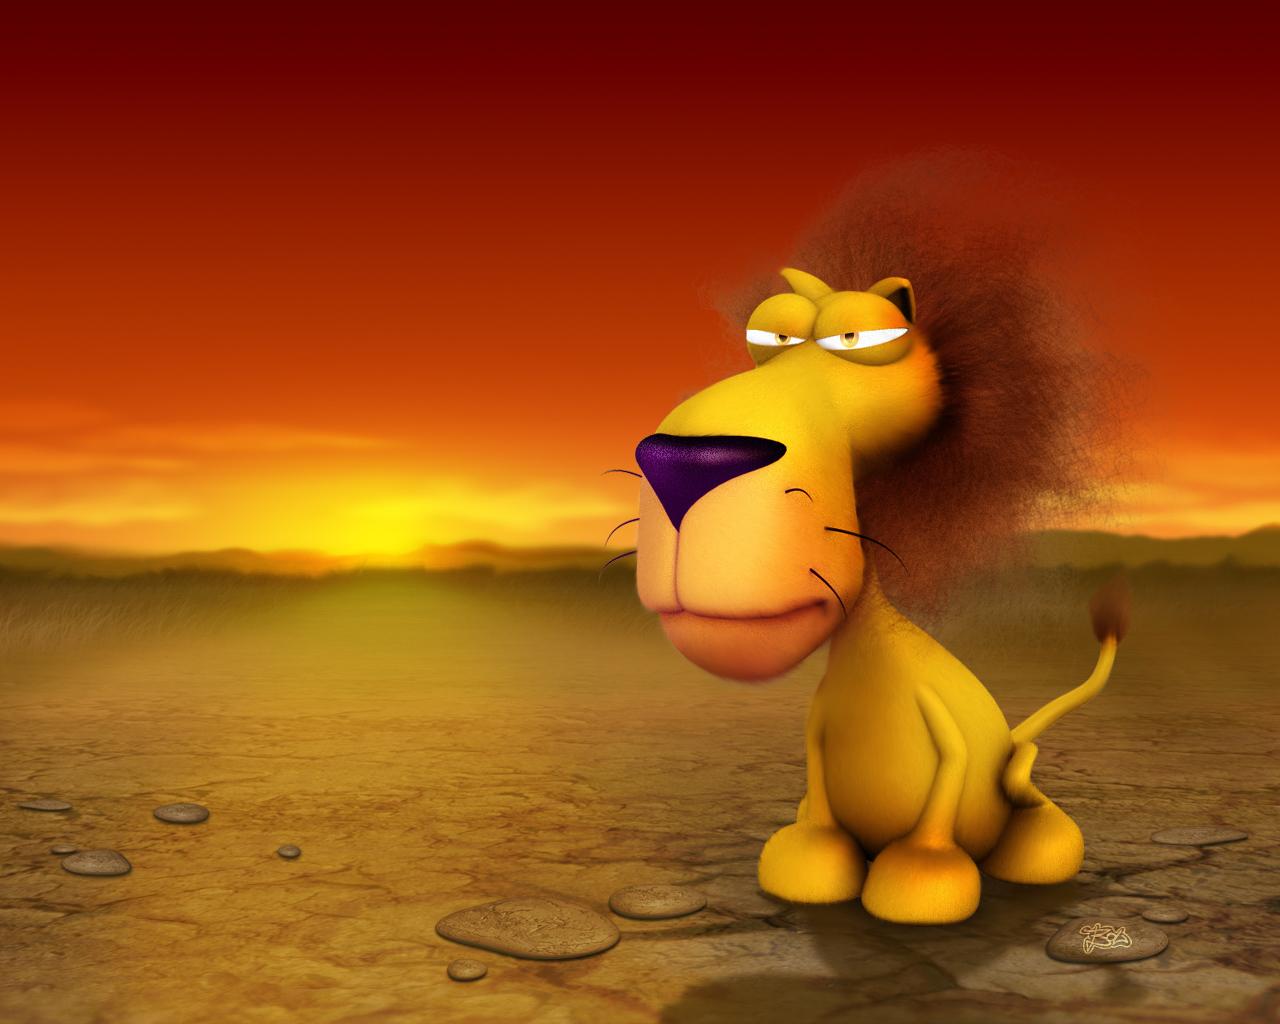 The Cat Funny 3D Cartoon Wallpapers   Desktop Background 1280x1024